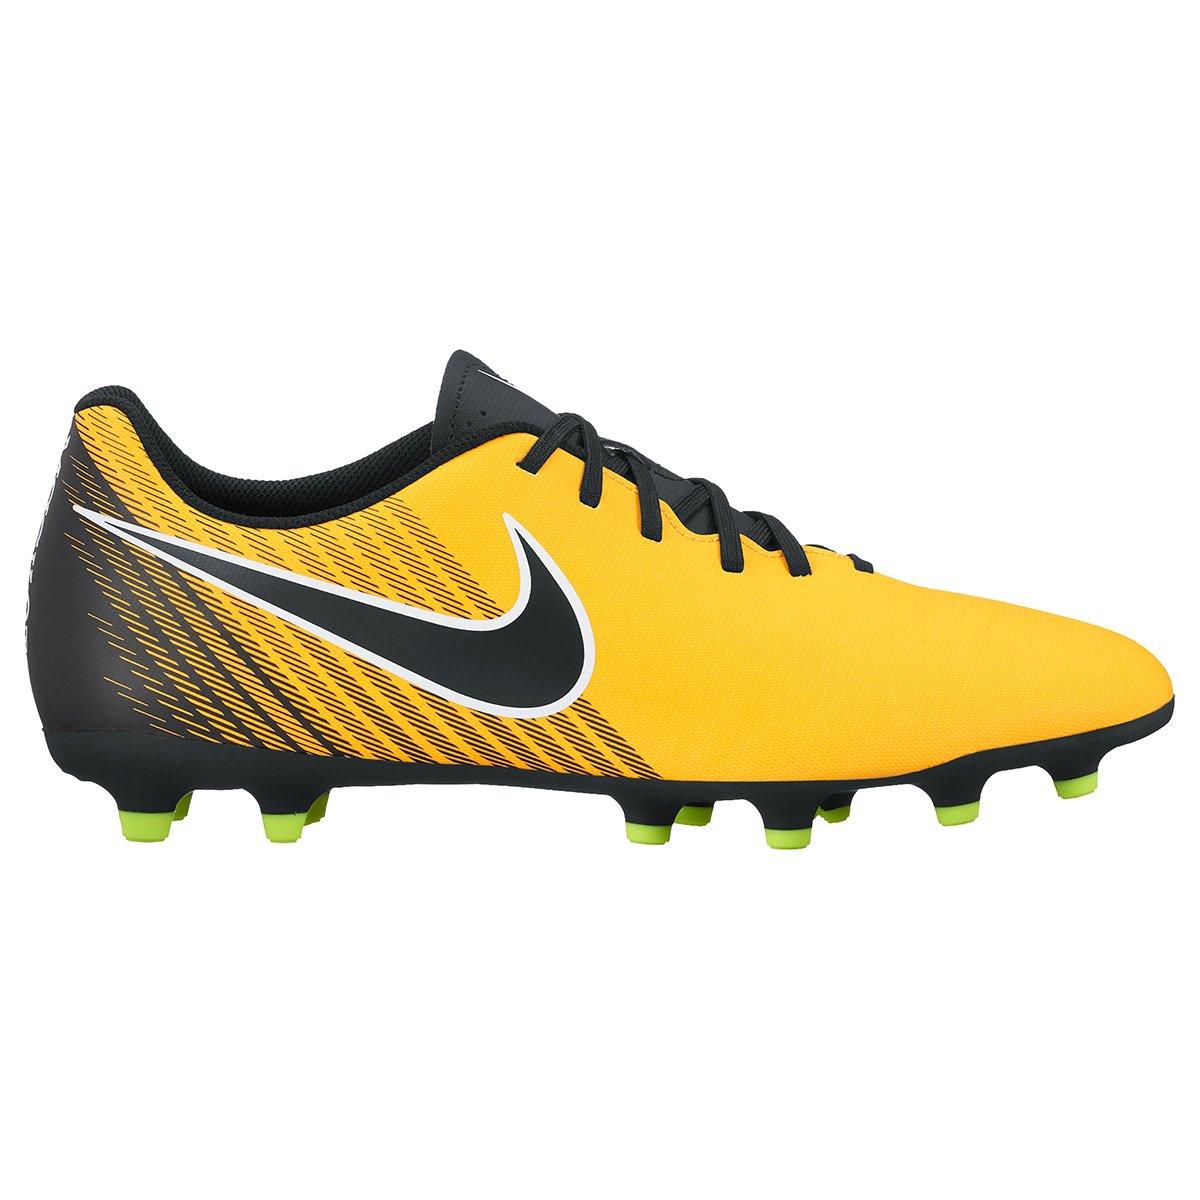 1fc6cef9088bc Chuteira Campo Nike Magista Ola II FG - Compre Agora